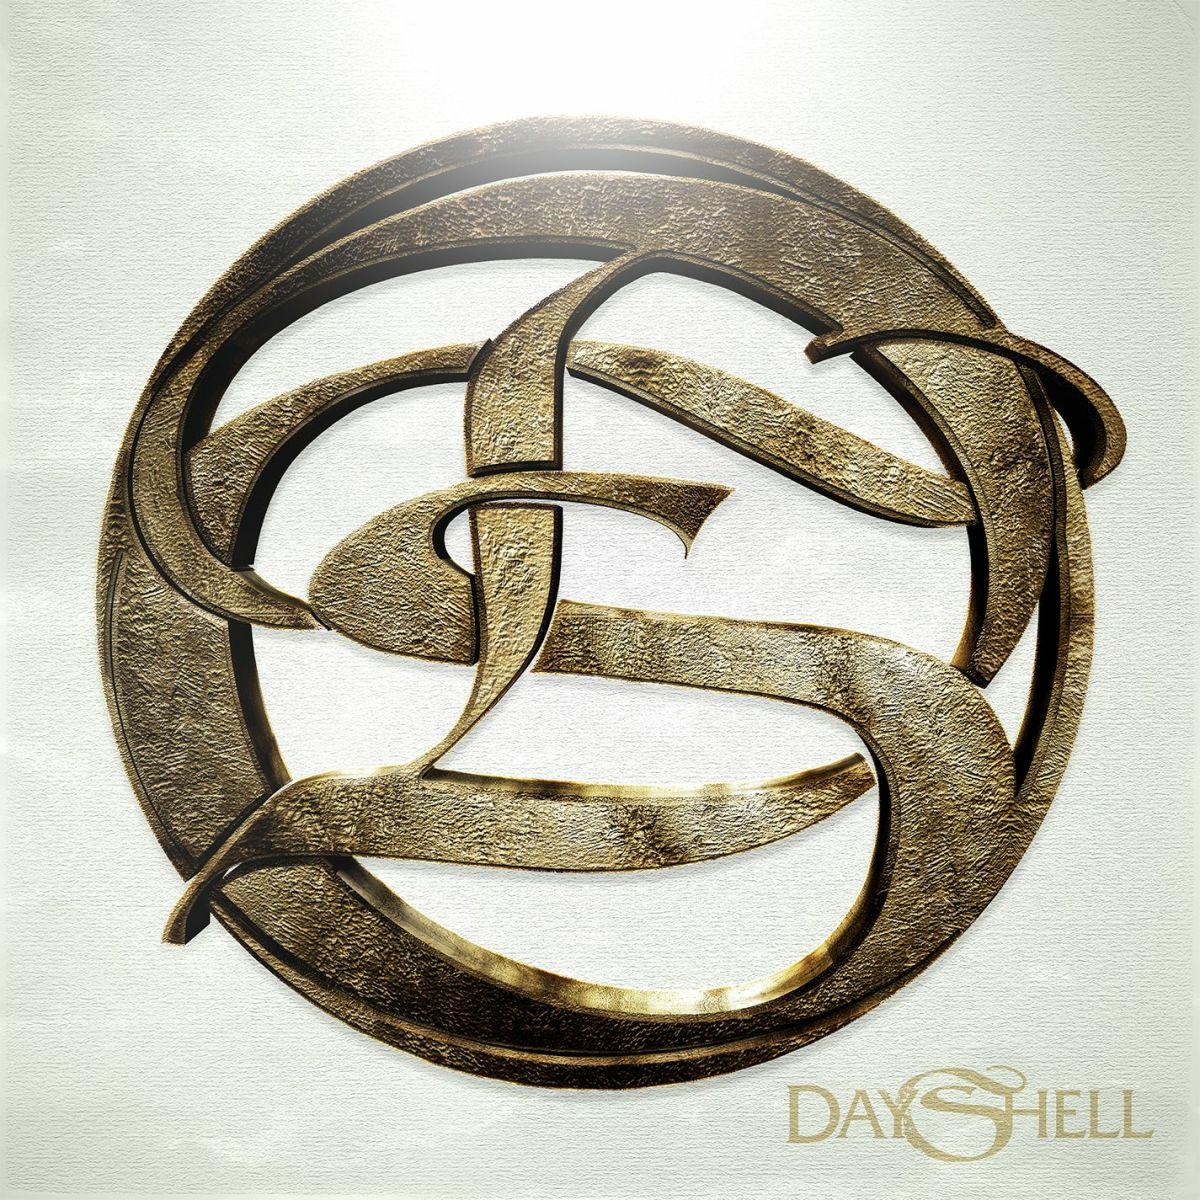 Dayshell - Dayshell (2013)